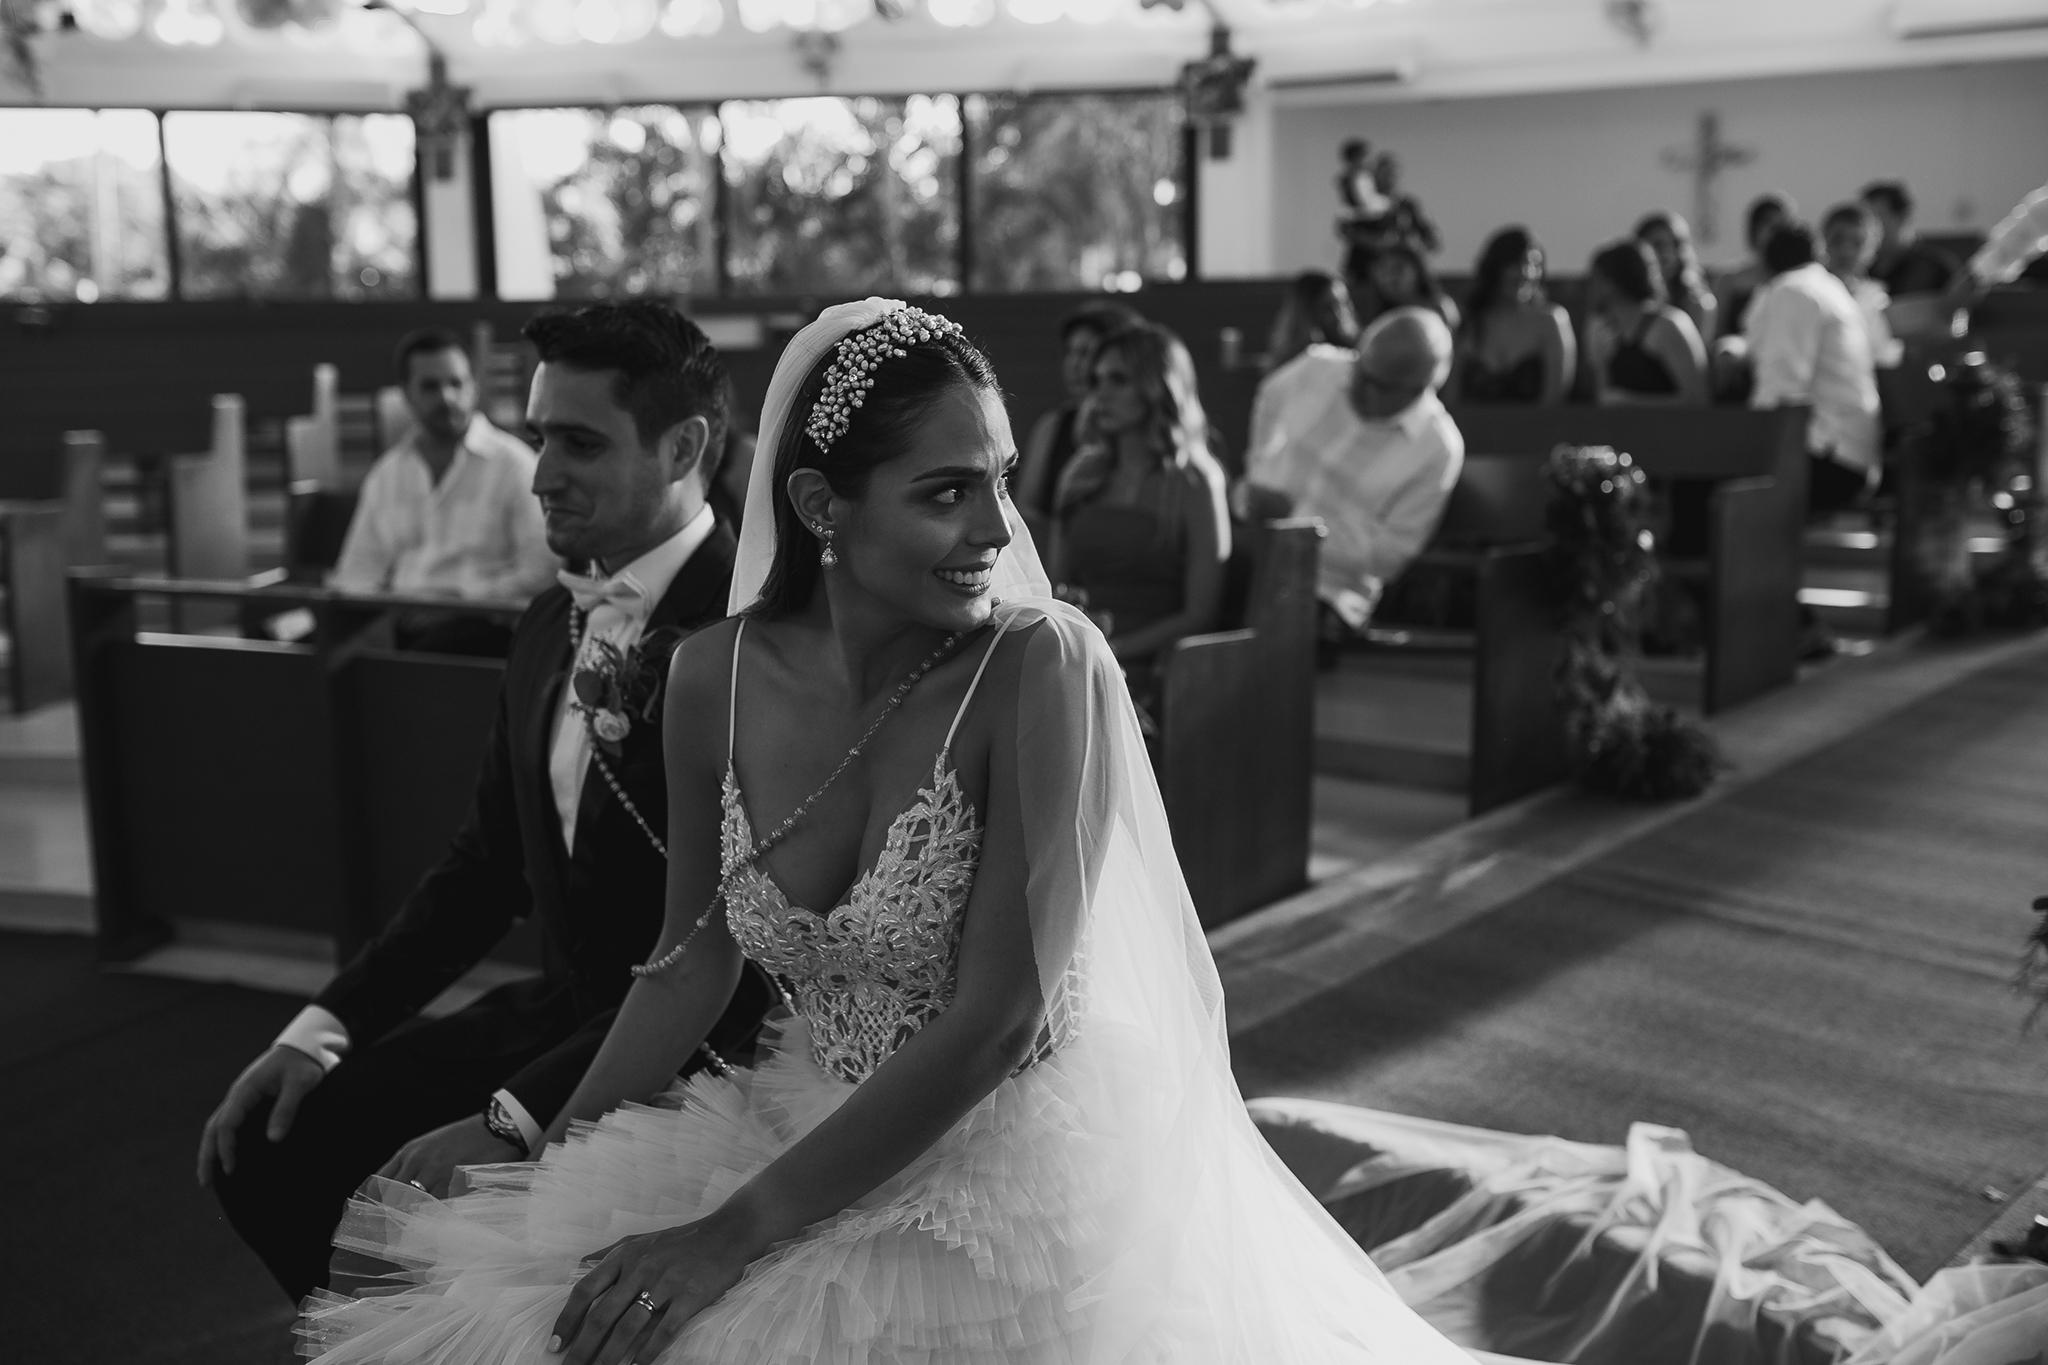 0702R&F__WeddingDestination_Weddingmerida_BodaMexico_FotografoDeBodas_FabrizioSimoneenFotografo.jpg